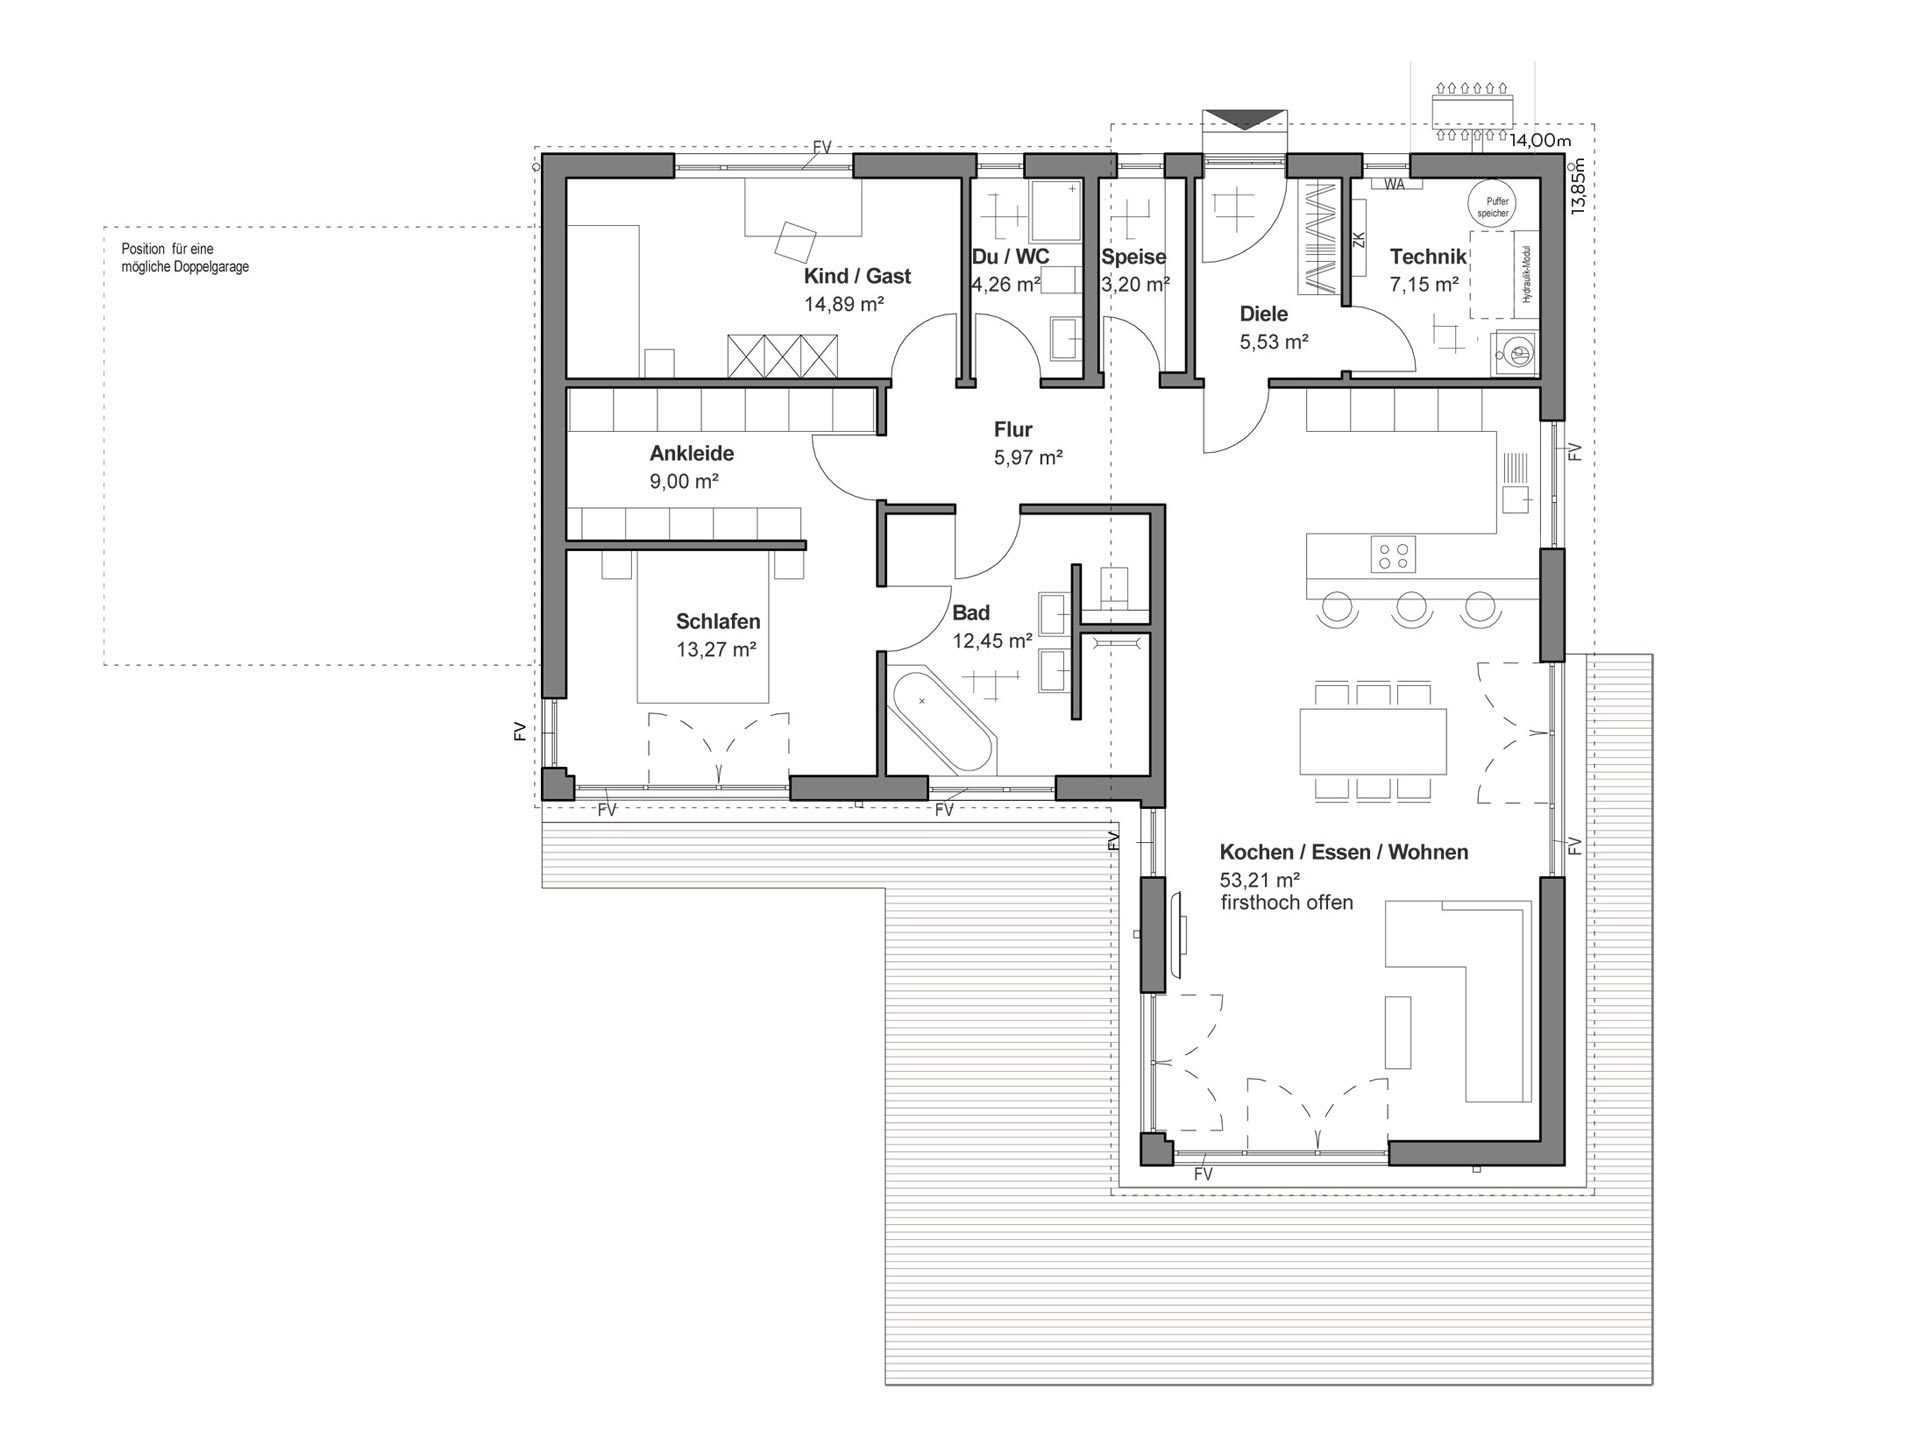 Musterhaus bungalow l form  ▷ Bungalow bauen - Anbieter, Preise & Grundrisse im Überblick